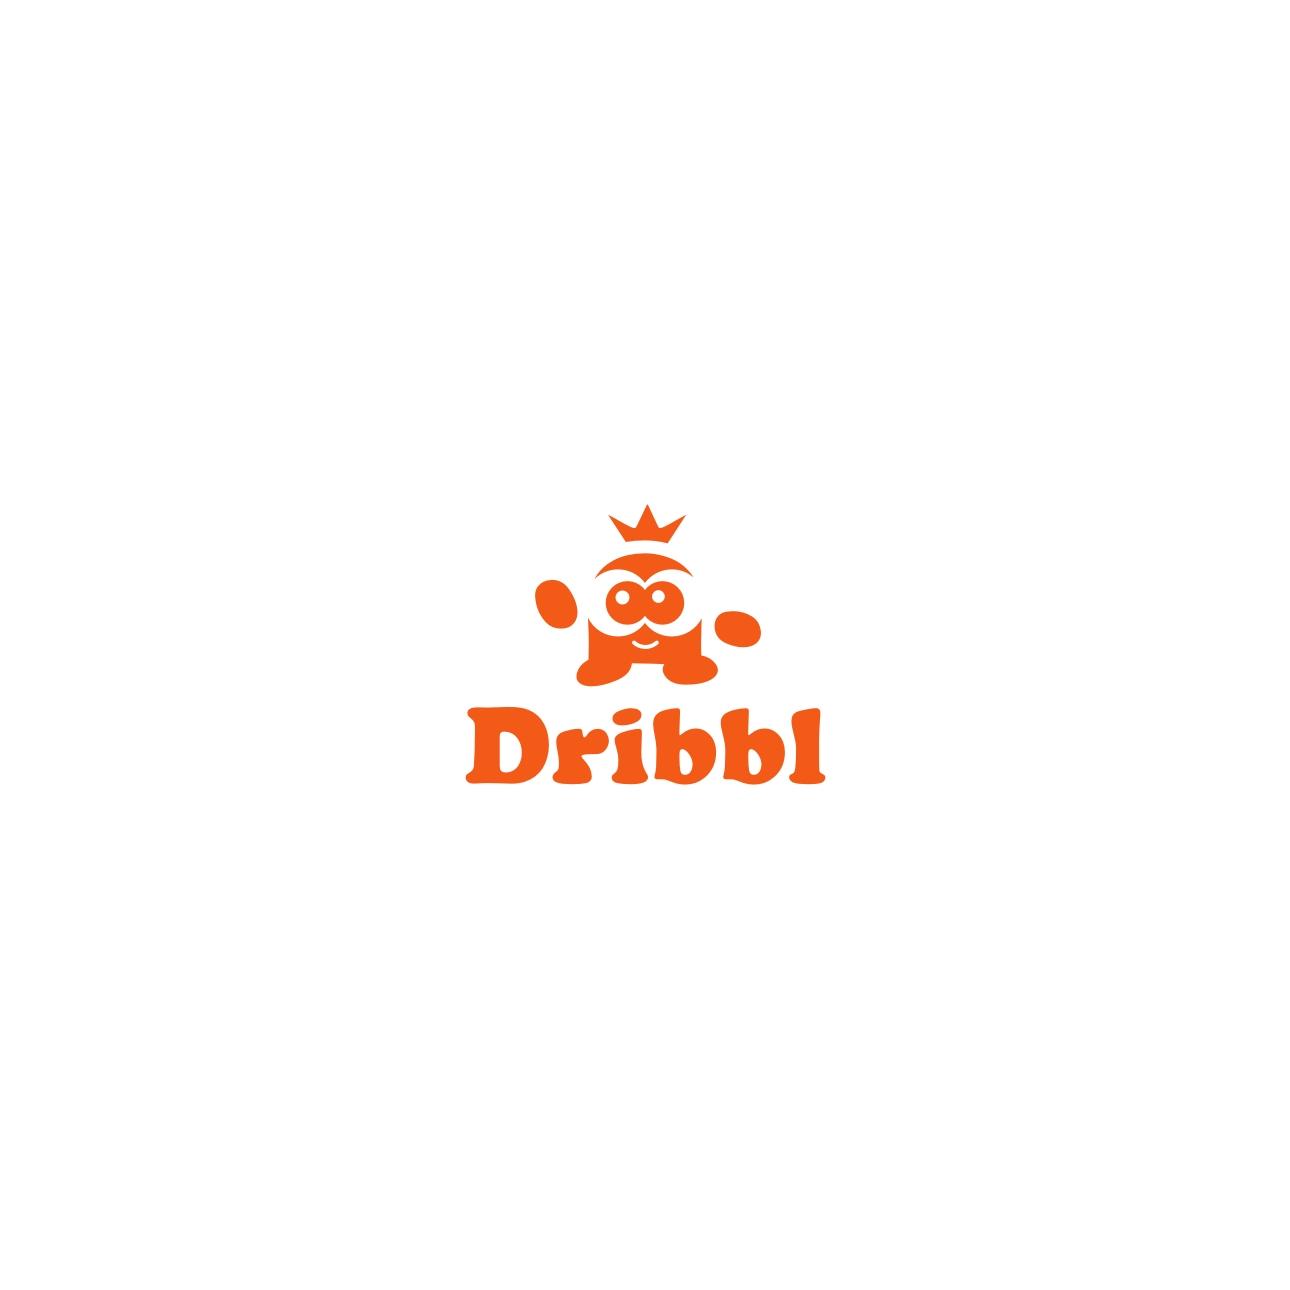 Разработка логотипа для сайта Dribbl.ru фото f_2675aa0d759b30d8.jpg